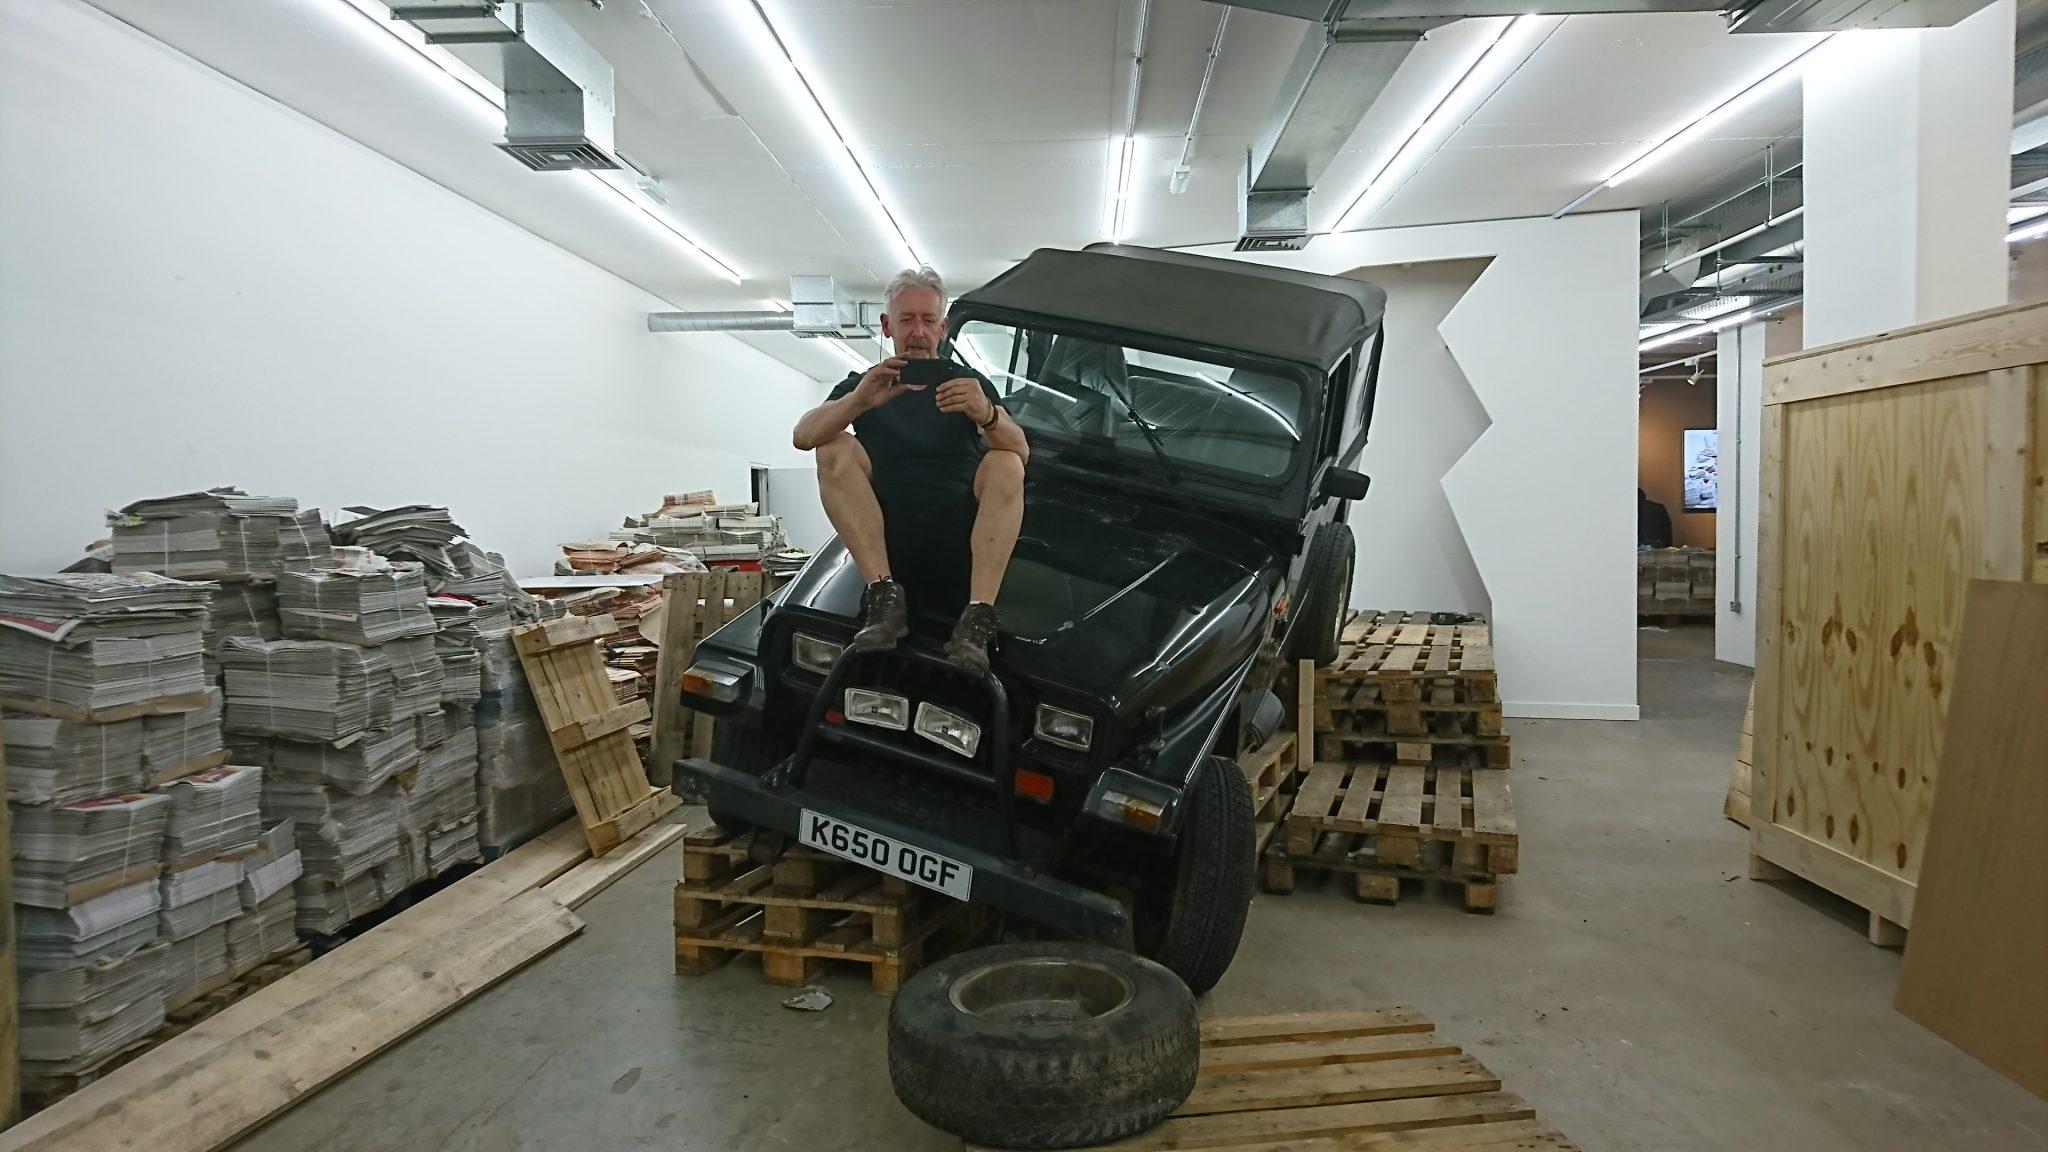 DAVID MACH INCOMING Solo exhibition